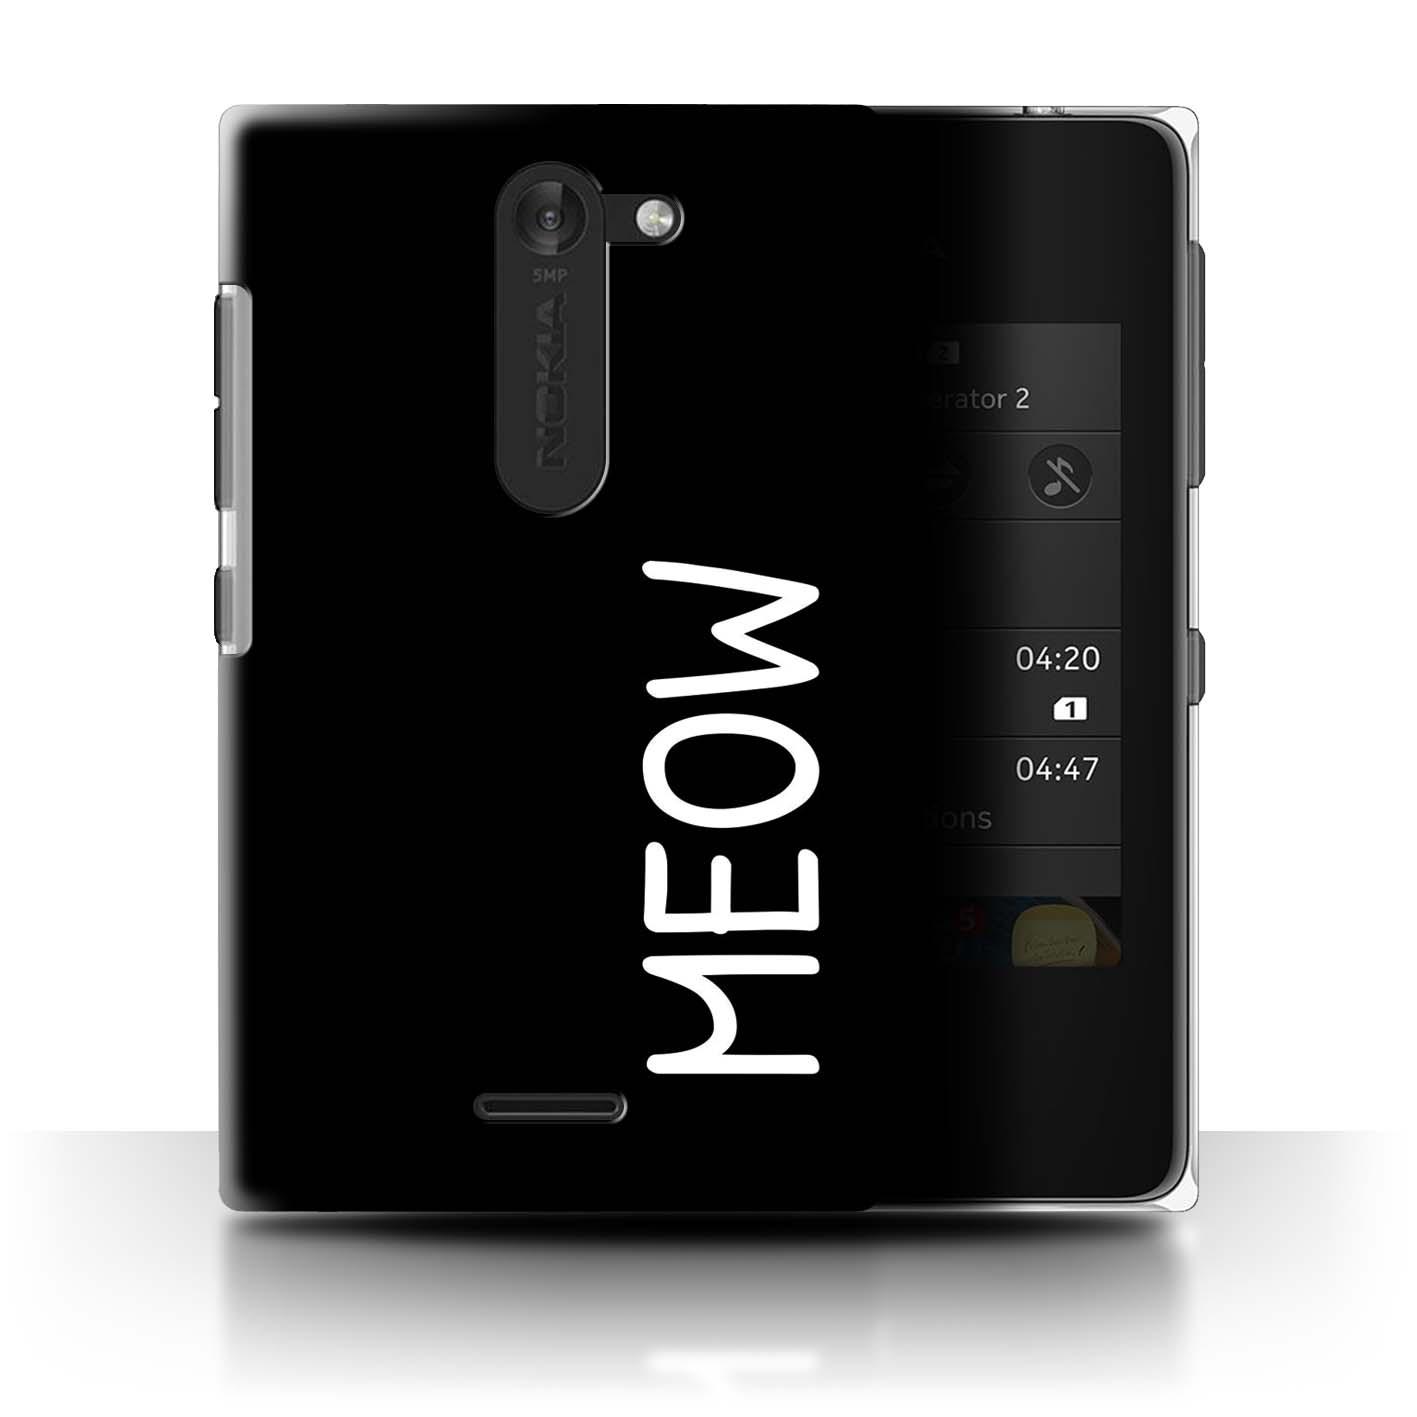 Stuff4-Huelle-Case-Backcover-fuer-Nokia-Asha-502-Dual-Niedliche-Cartoon-Katze